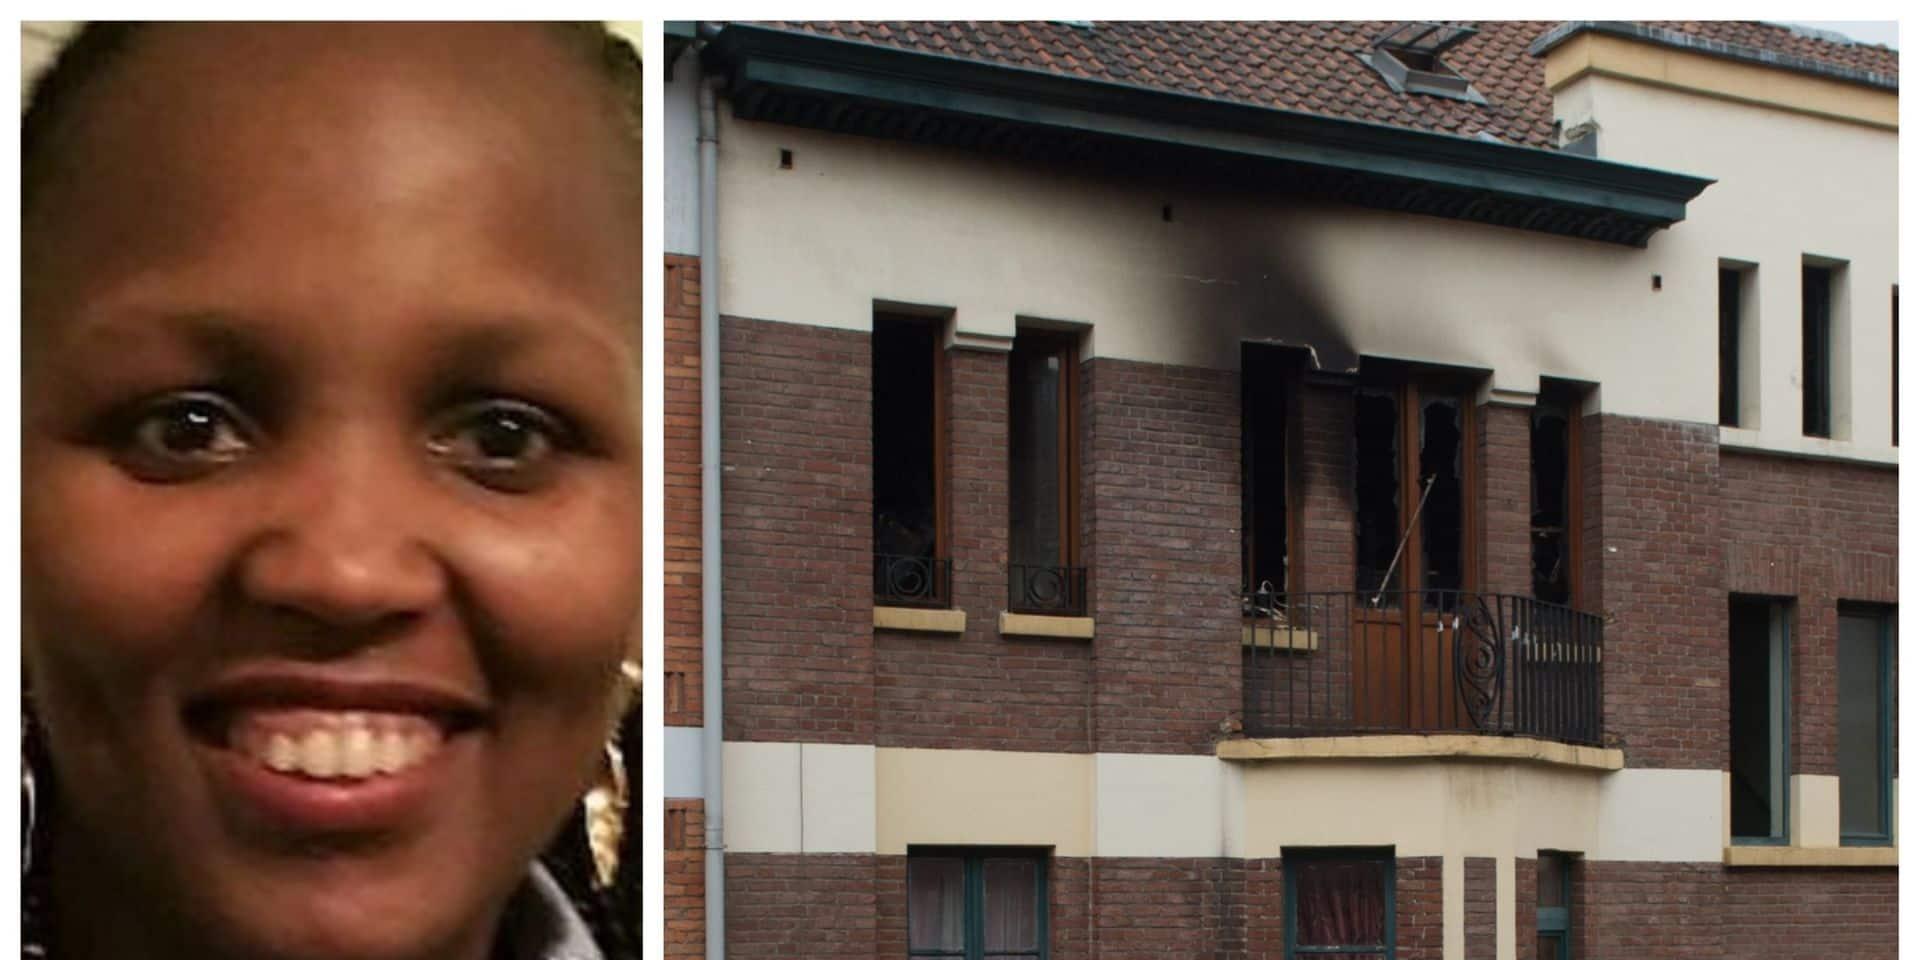 Incendie mortel au Foyer schaerbeekois : La famille d'Anitha sera indemnisée